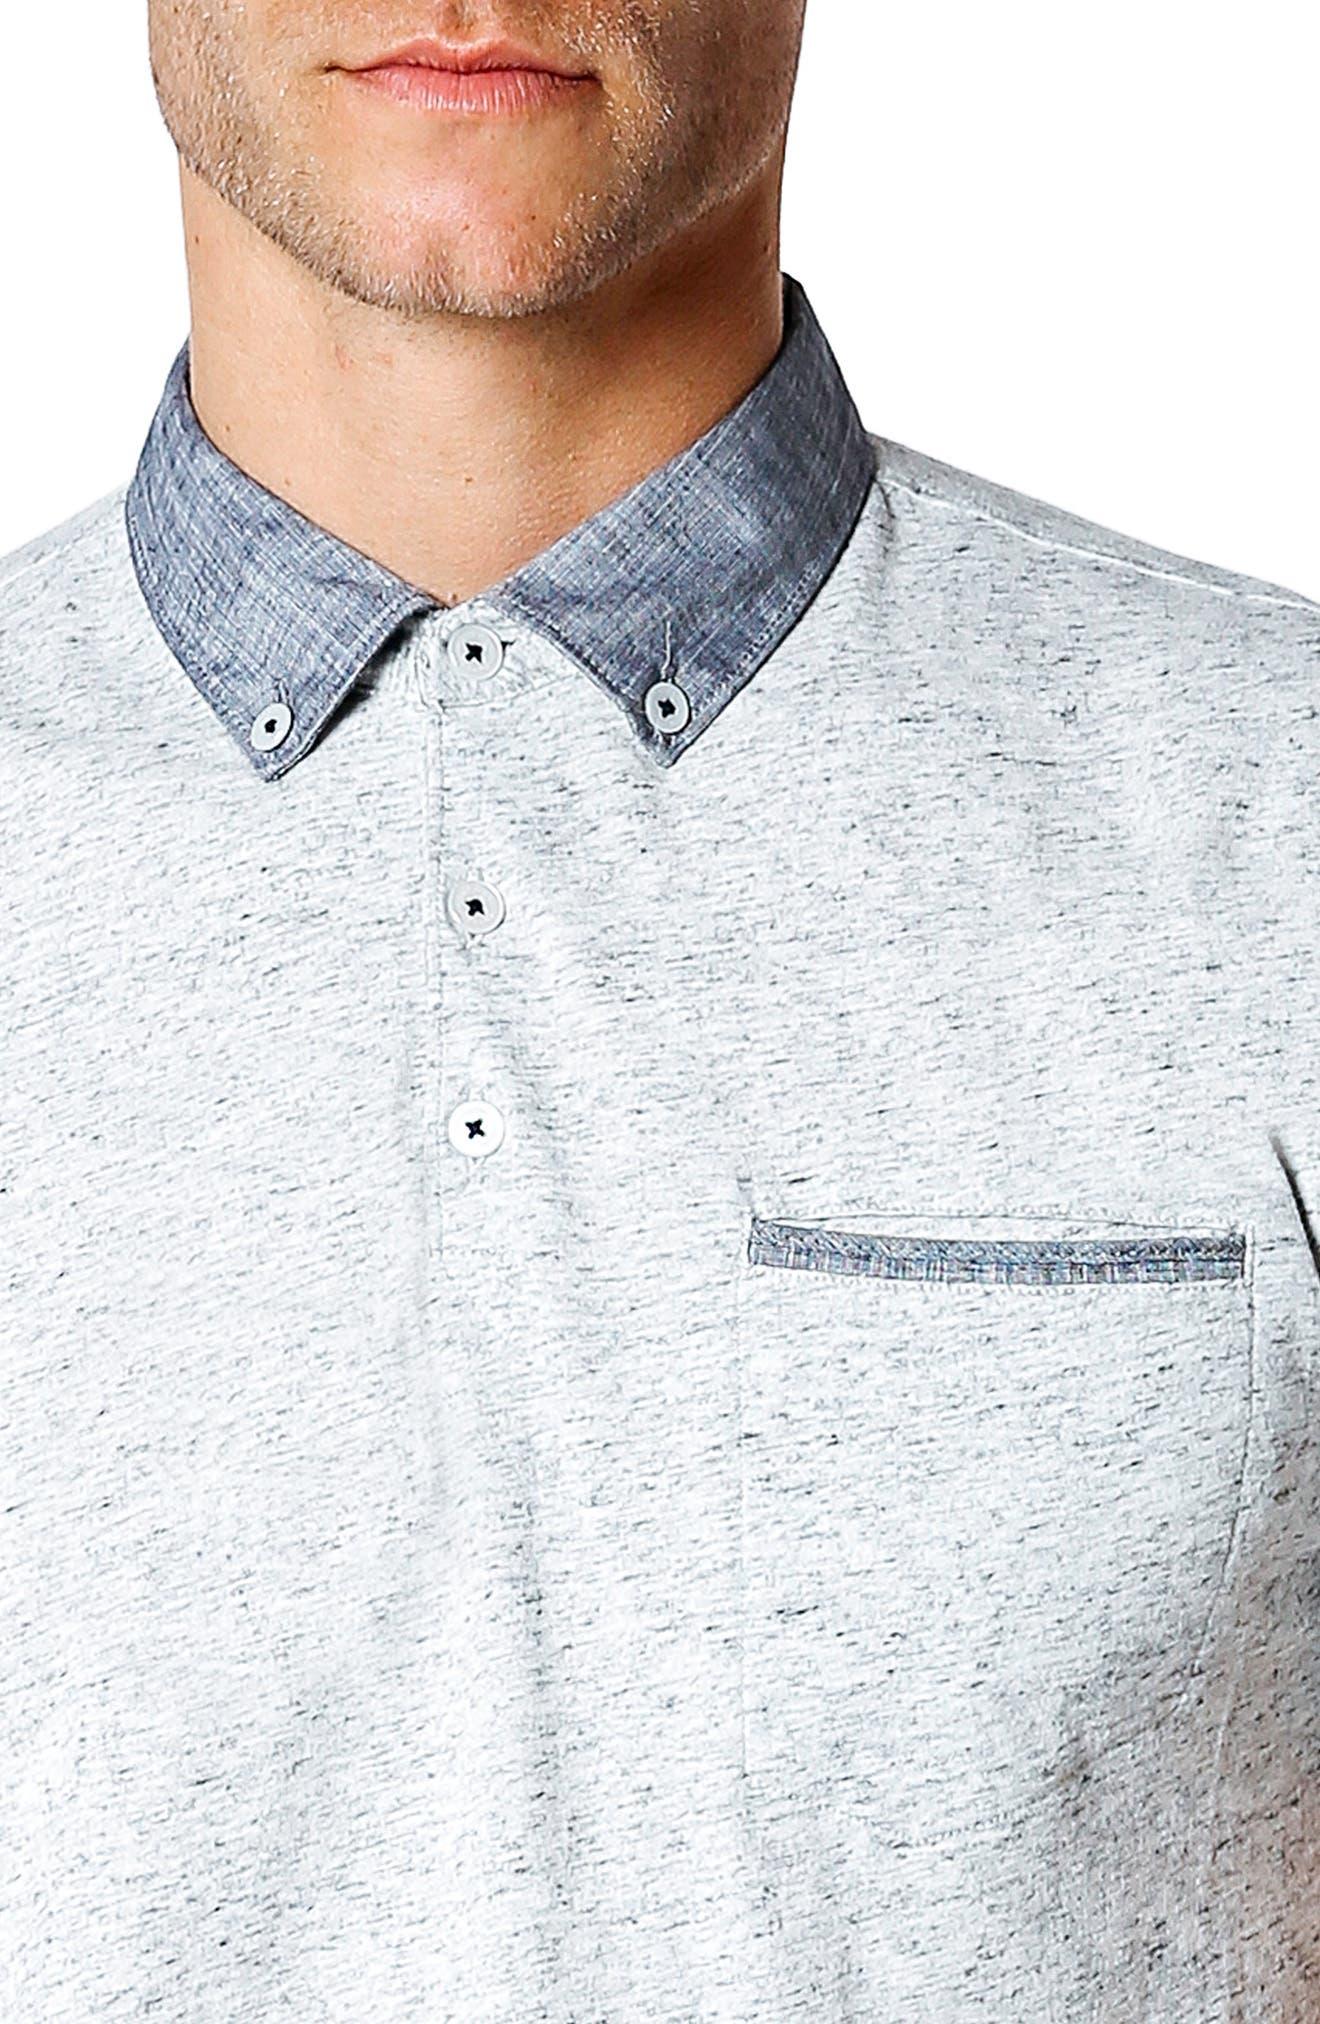 GOOD MAN BRAND,                             Trim Fit Polo Shirt,                             Alternate thumbnail 4, color,                             030